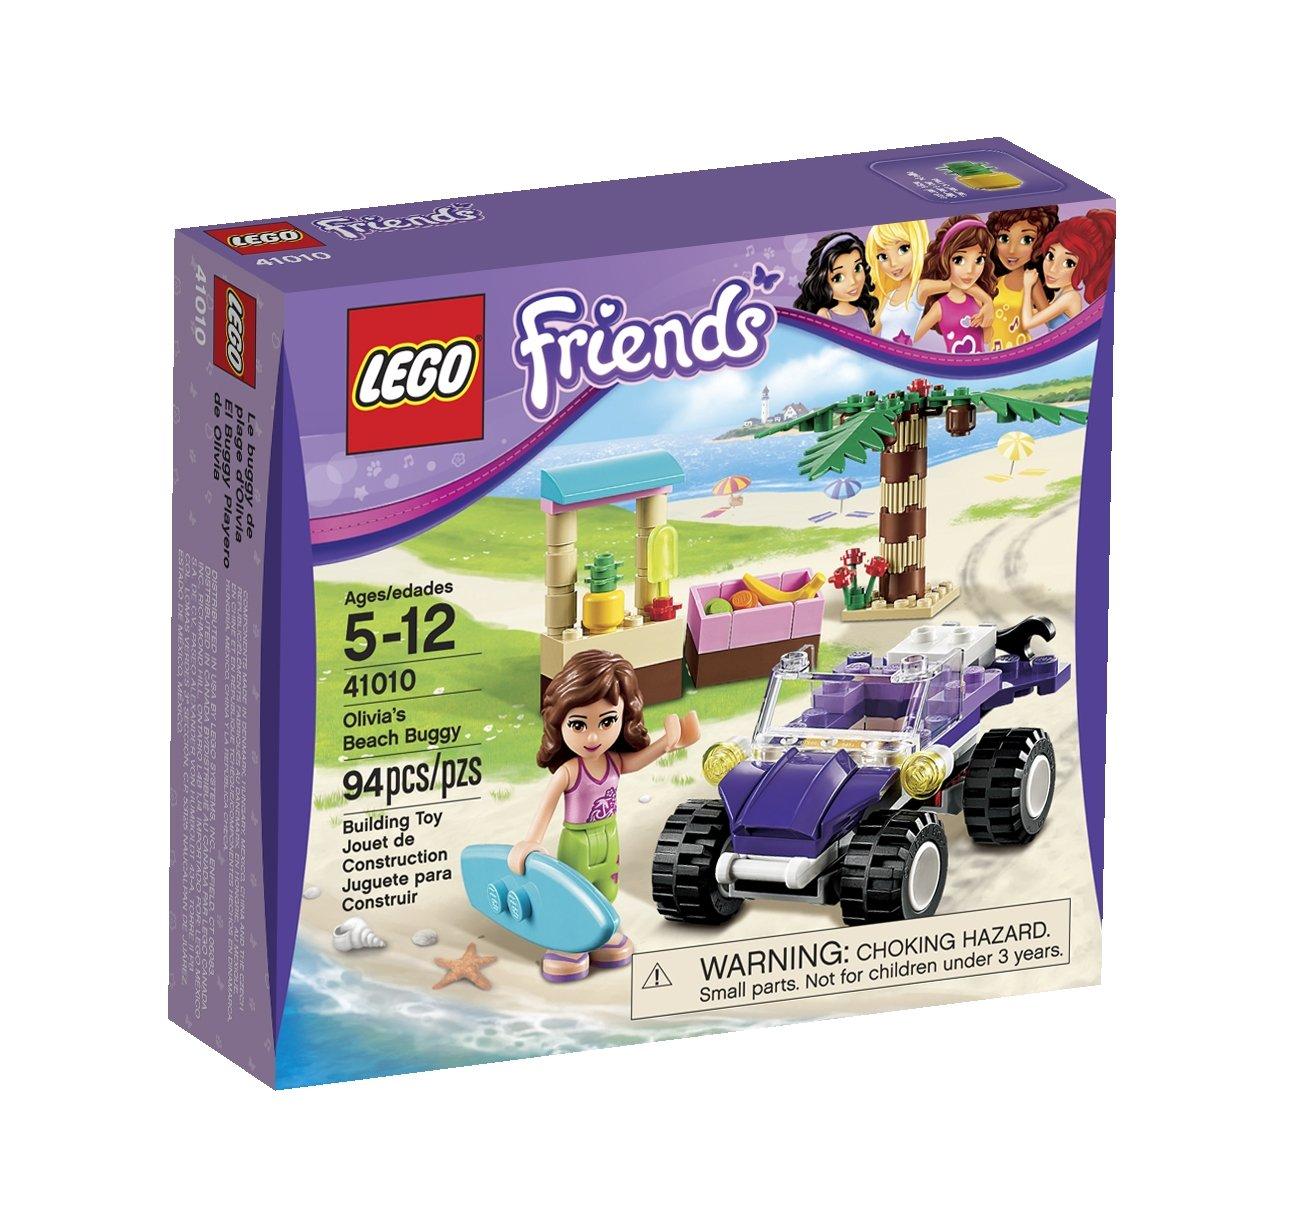 Amazoncom Lego Friends Olivias Beach Buggy 41010 Toys Games